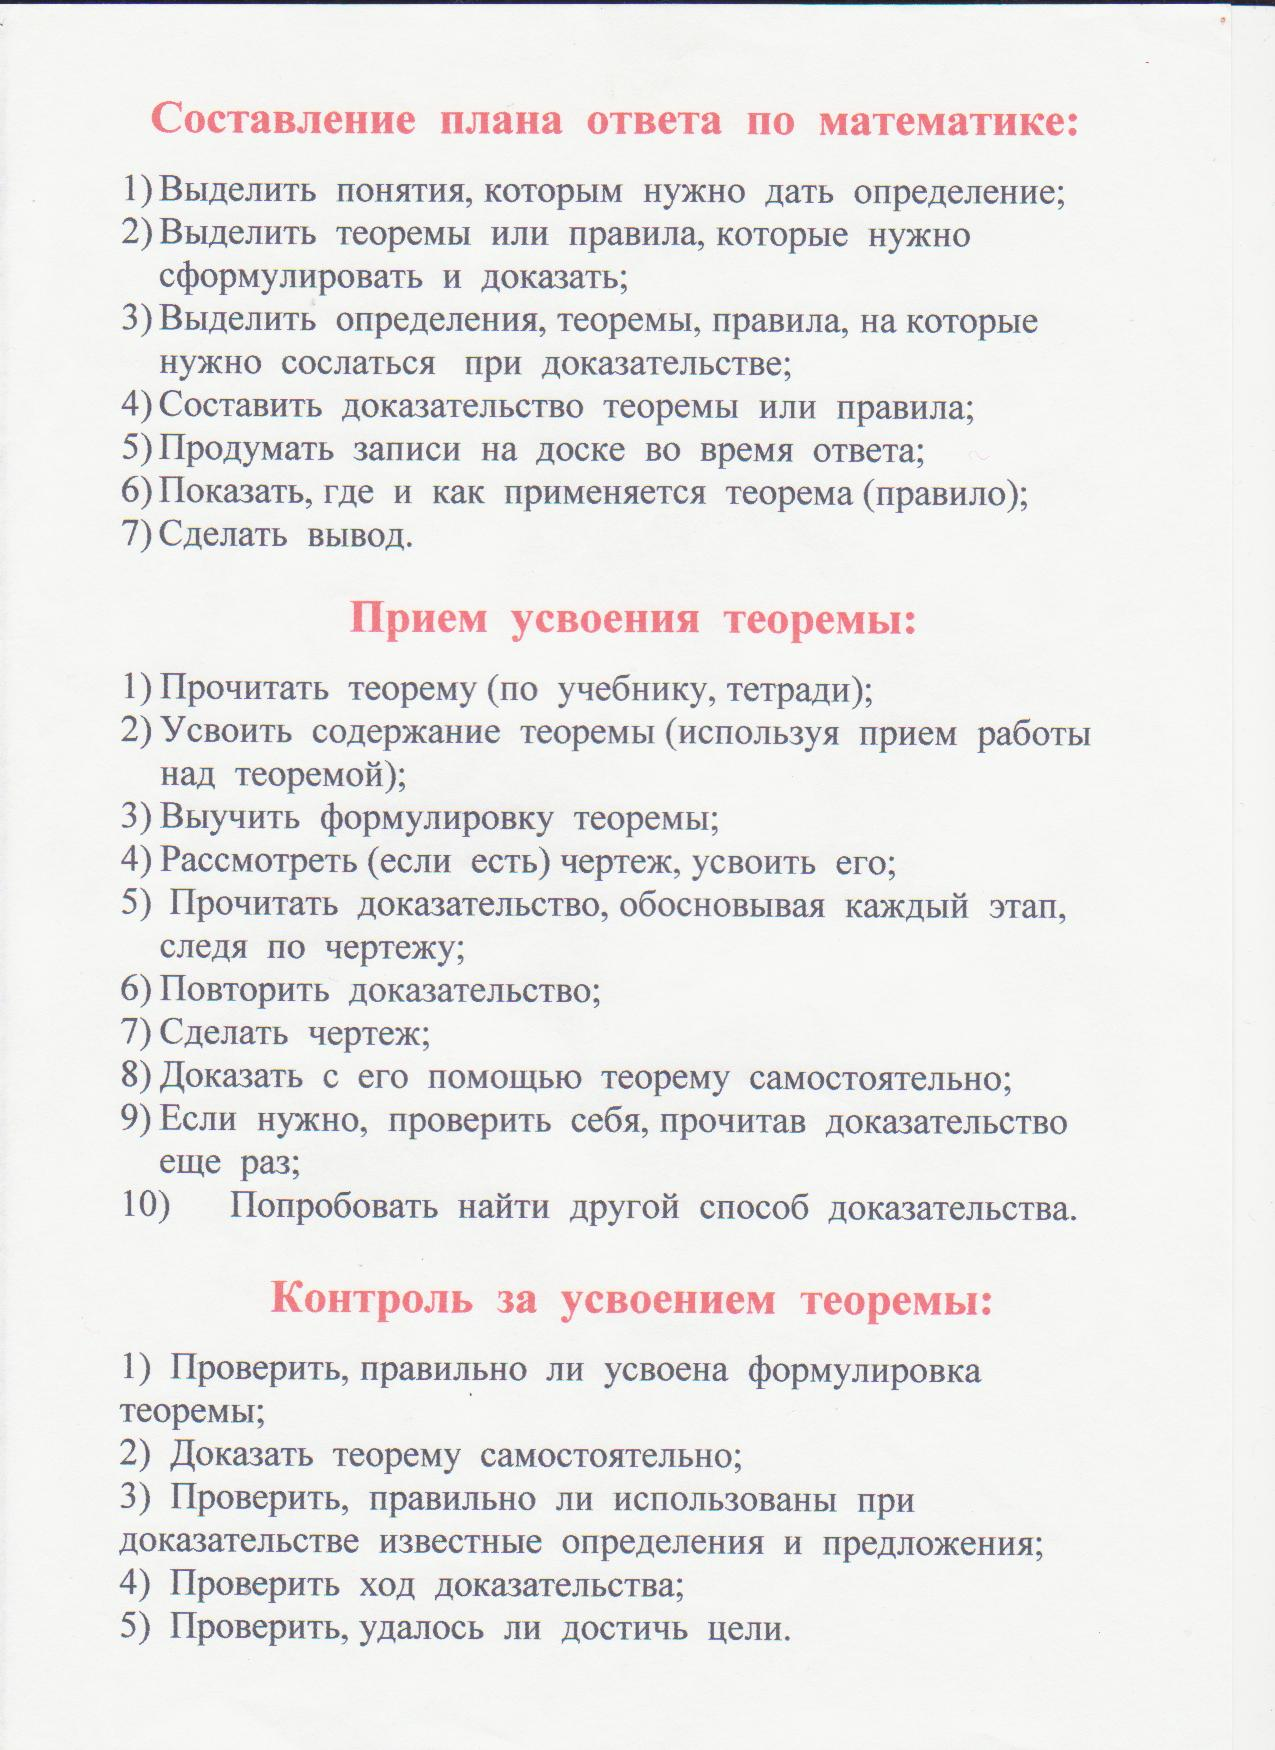 C:\Users\Юля\Desktop\Кузнецова аттестация\сканированные грамоты\Кузнецова 047.jpg